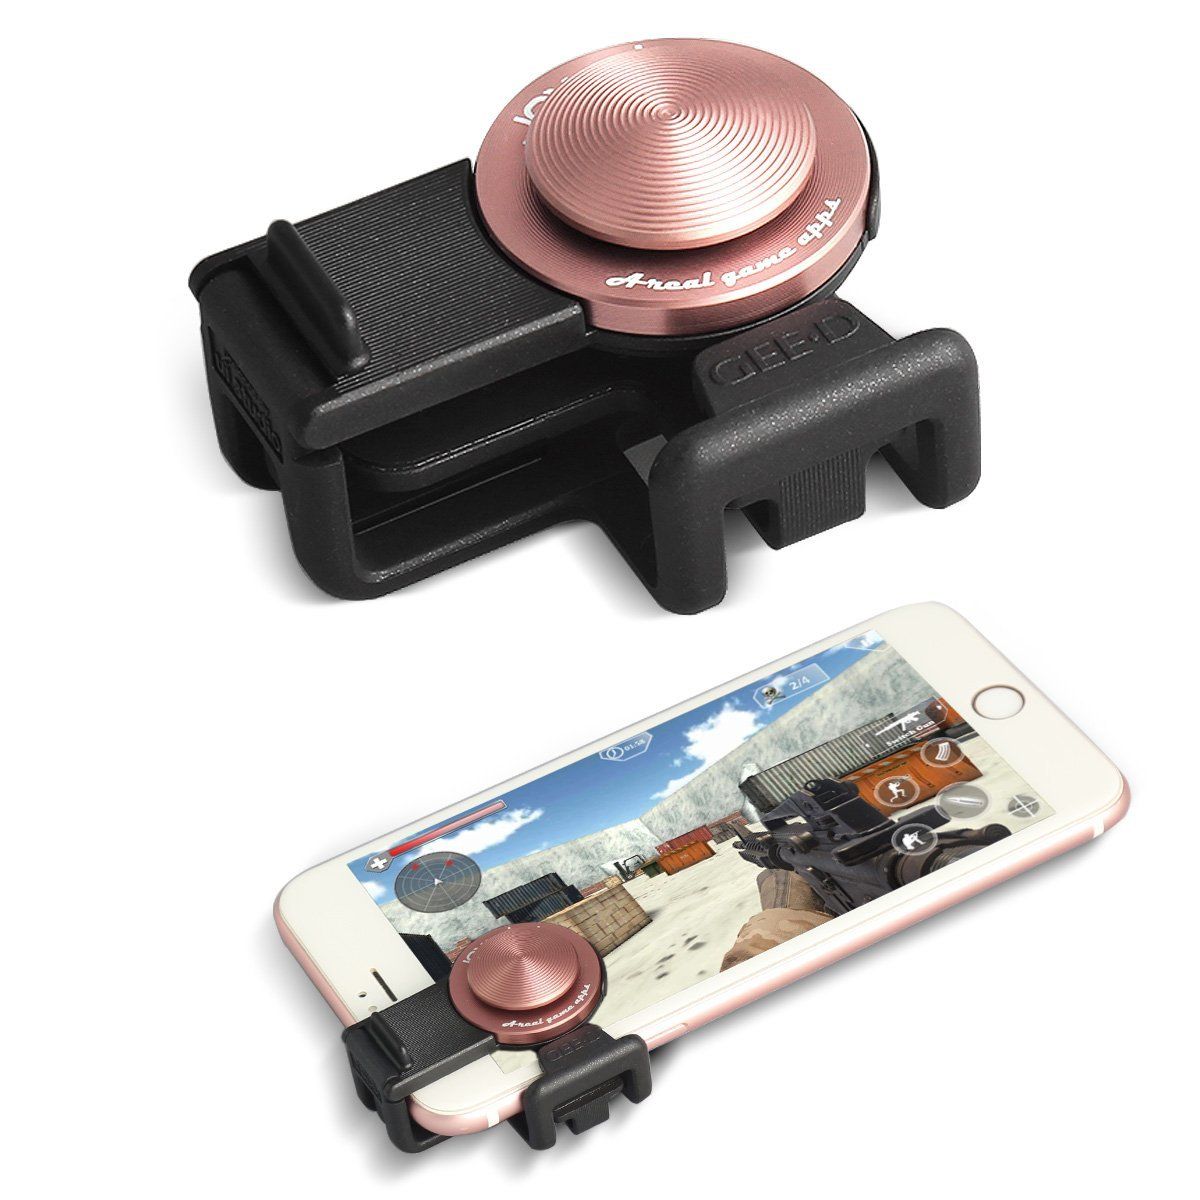 Controlador de juegos con joystick para teléfonos móviles